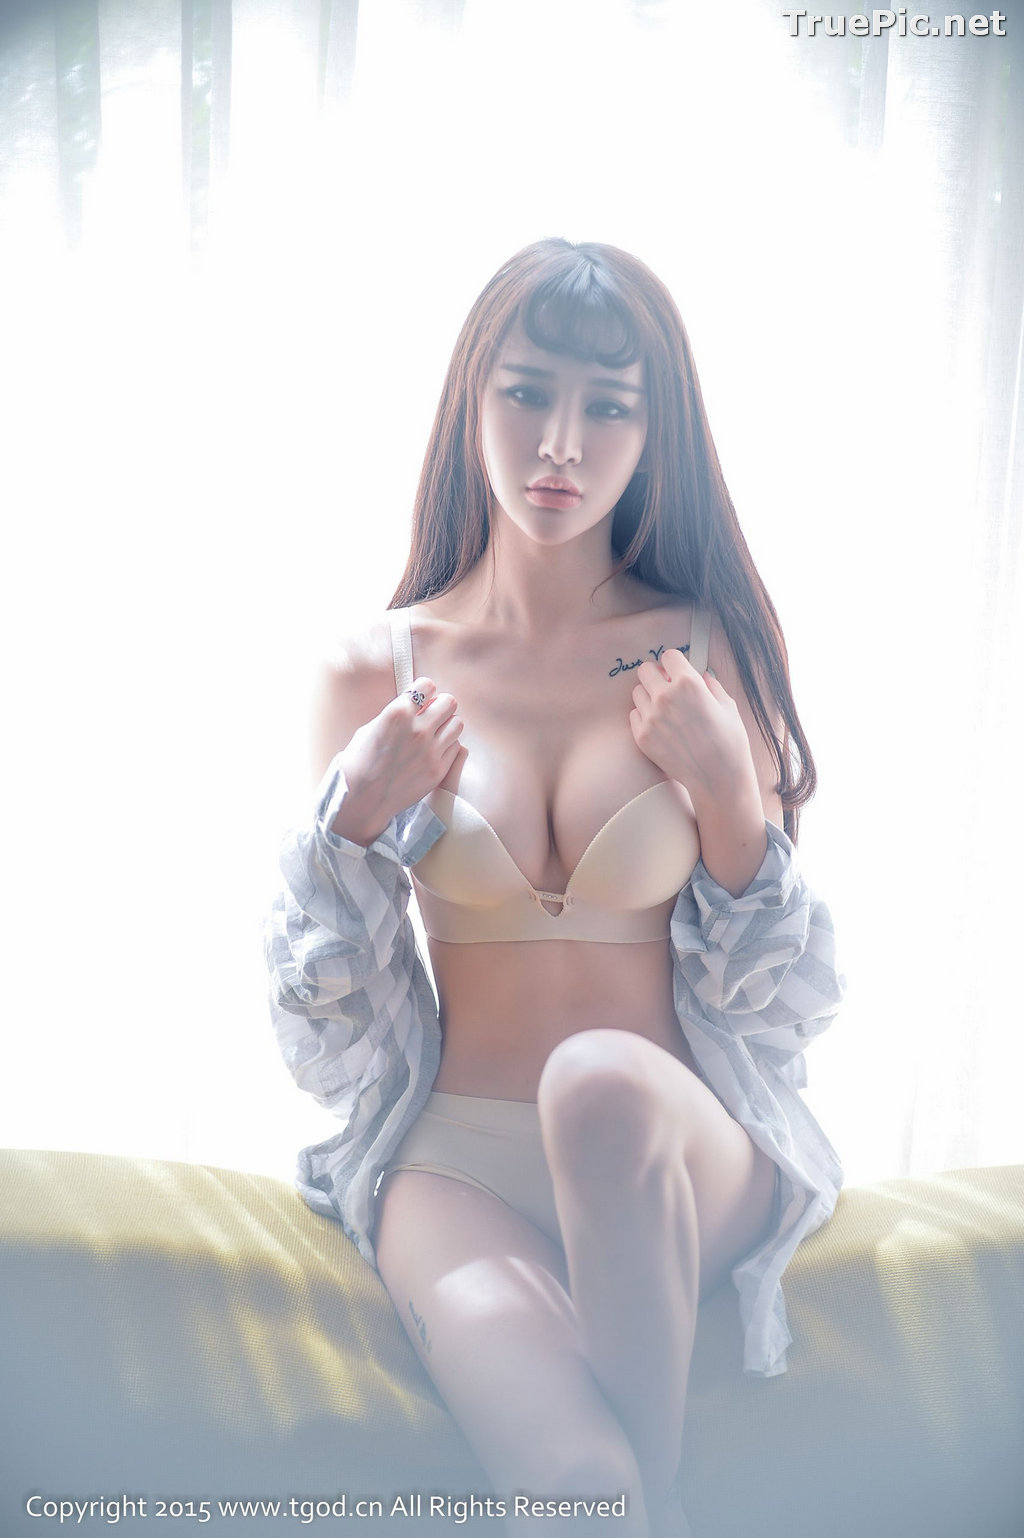 Image TGOD 2015-11-10 - Chinese Sexy Model - Cheryl (青树) - TruePic.net - Picture-2